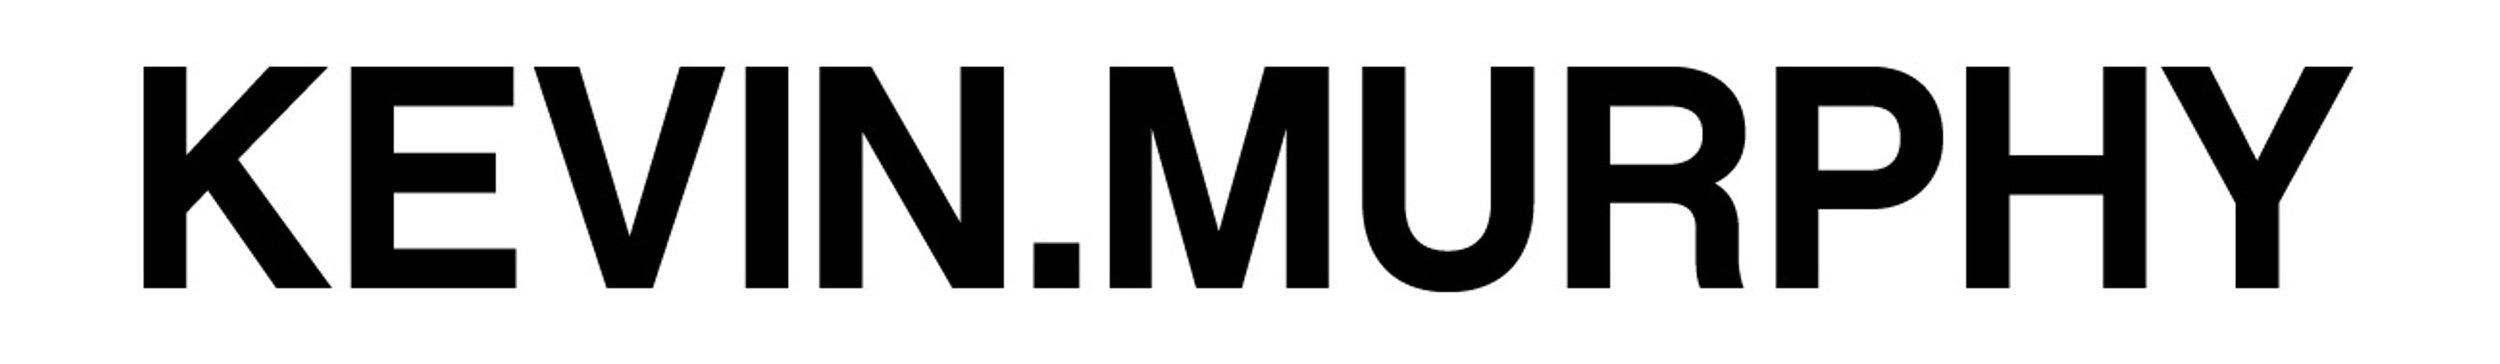 KM-Name.jpg